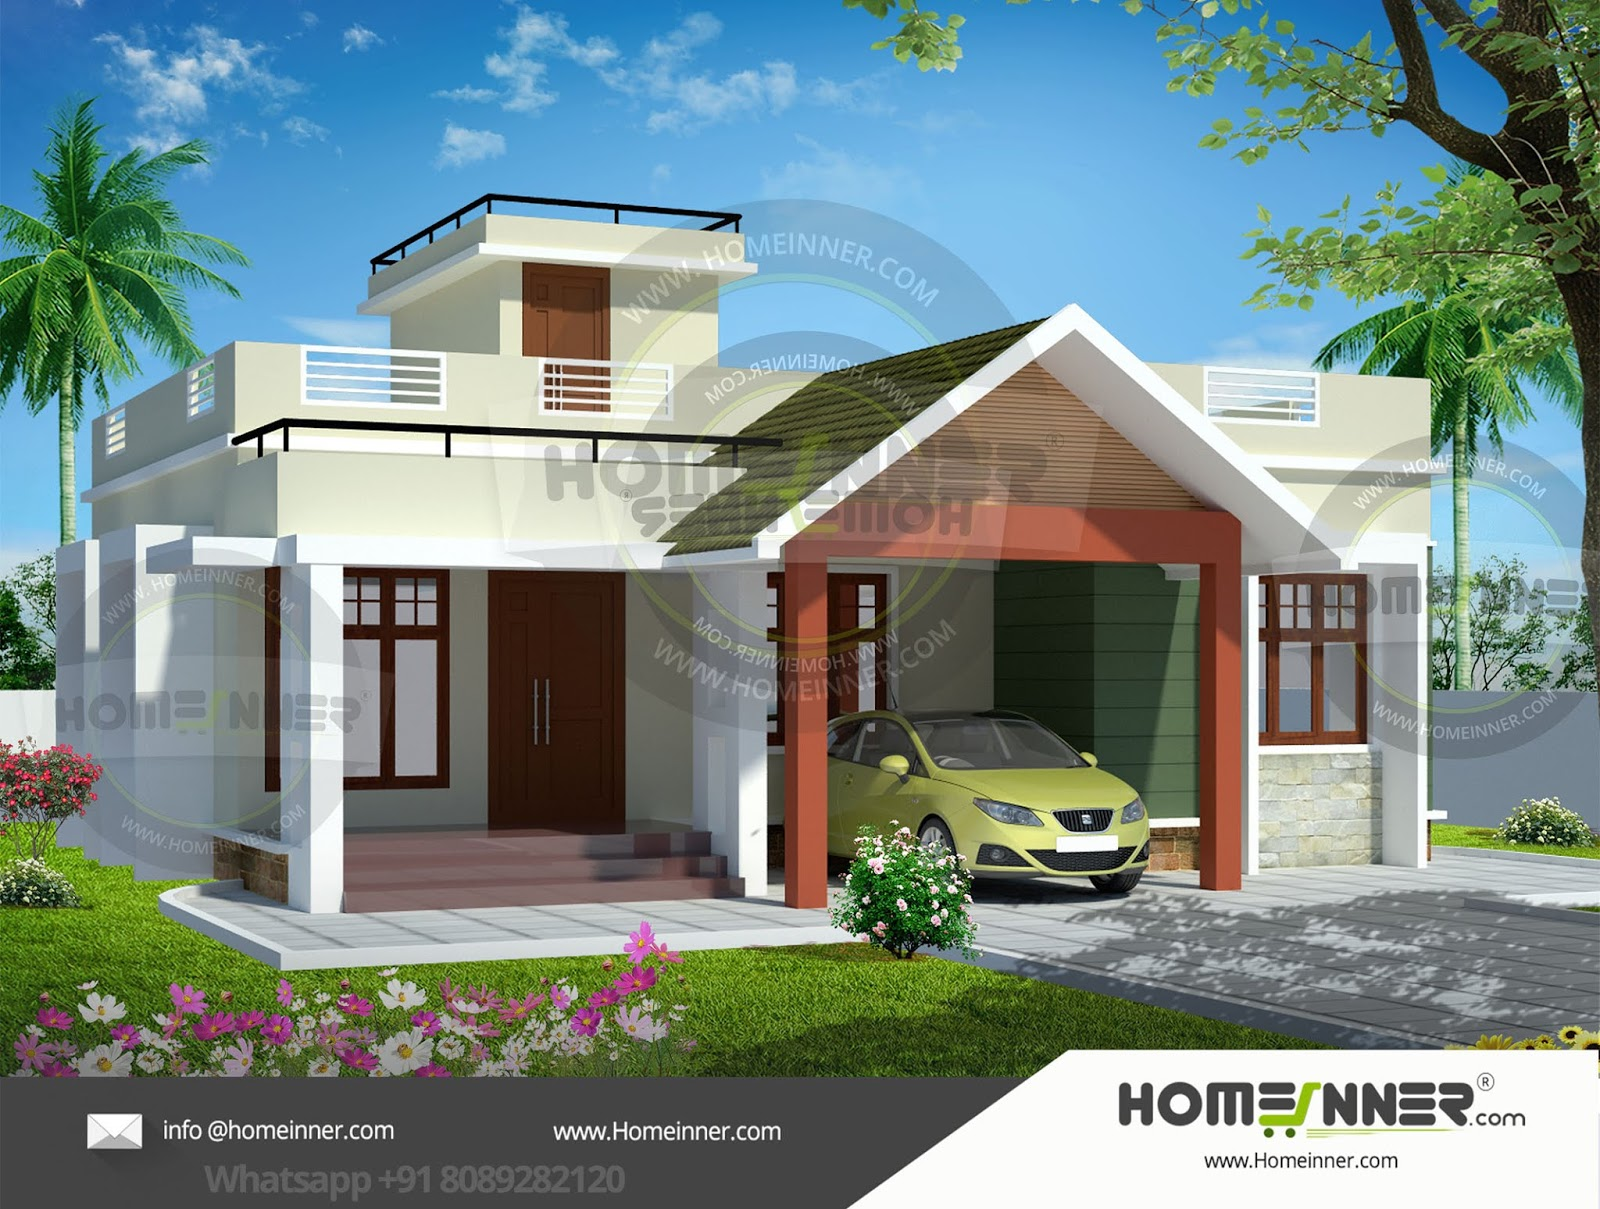 14 Lakh 2 BHK 993 sq ft Bihar Sharif Villa